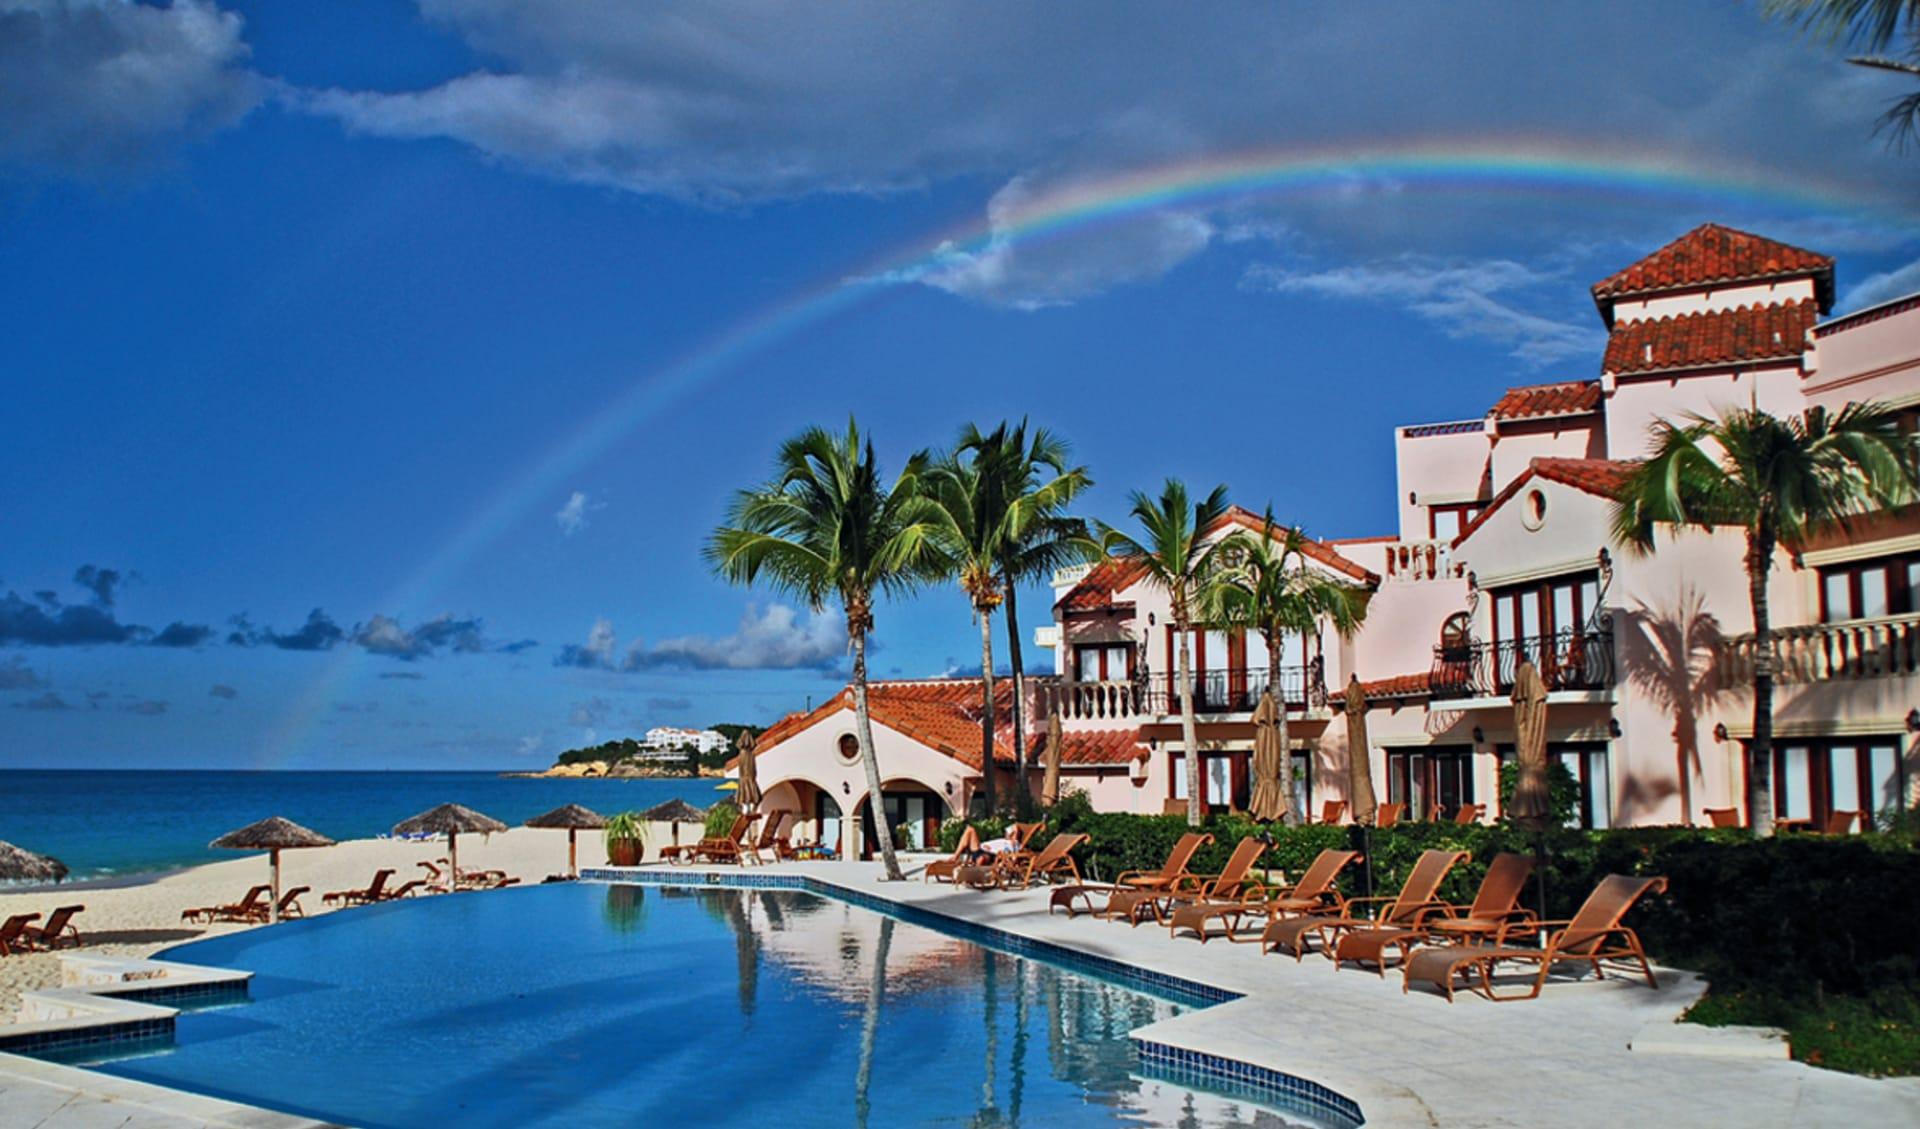 Frangipani Beach Resort in Meads Bay: pool frangipani beach resort pool meer regenbogen